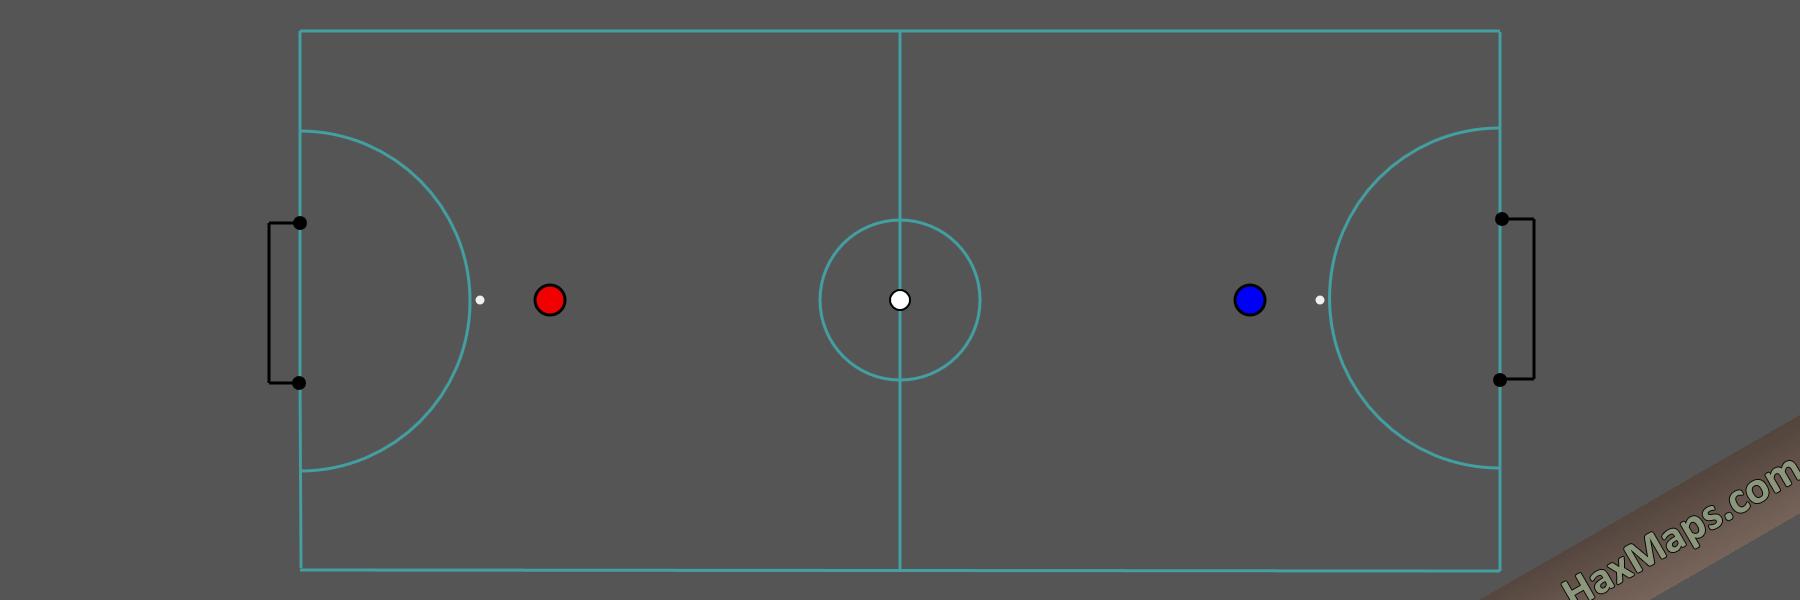 hax ball maps   Futsal LAFH